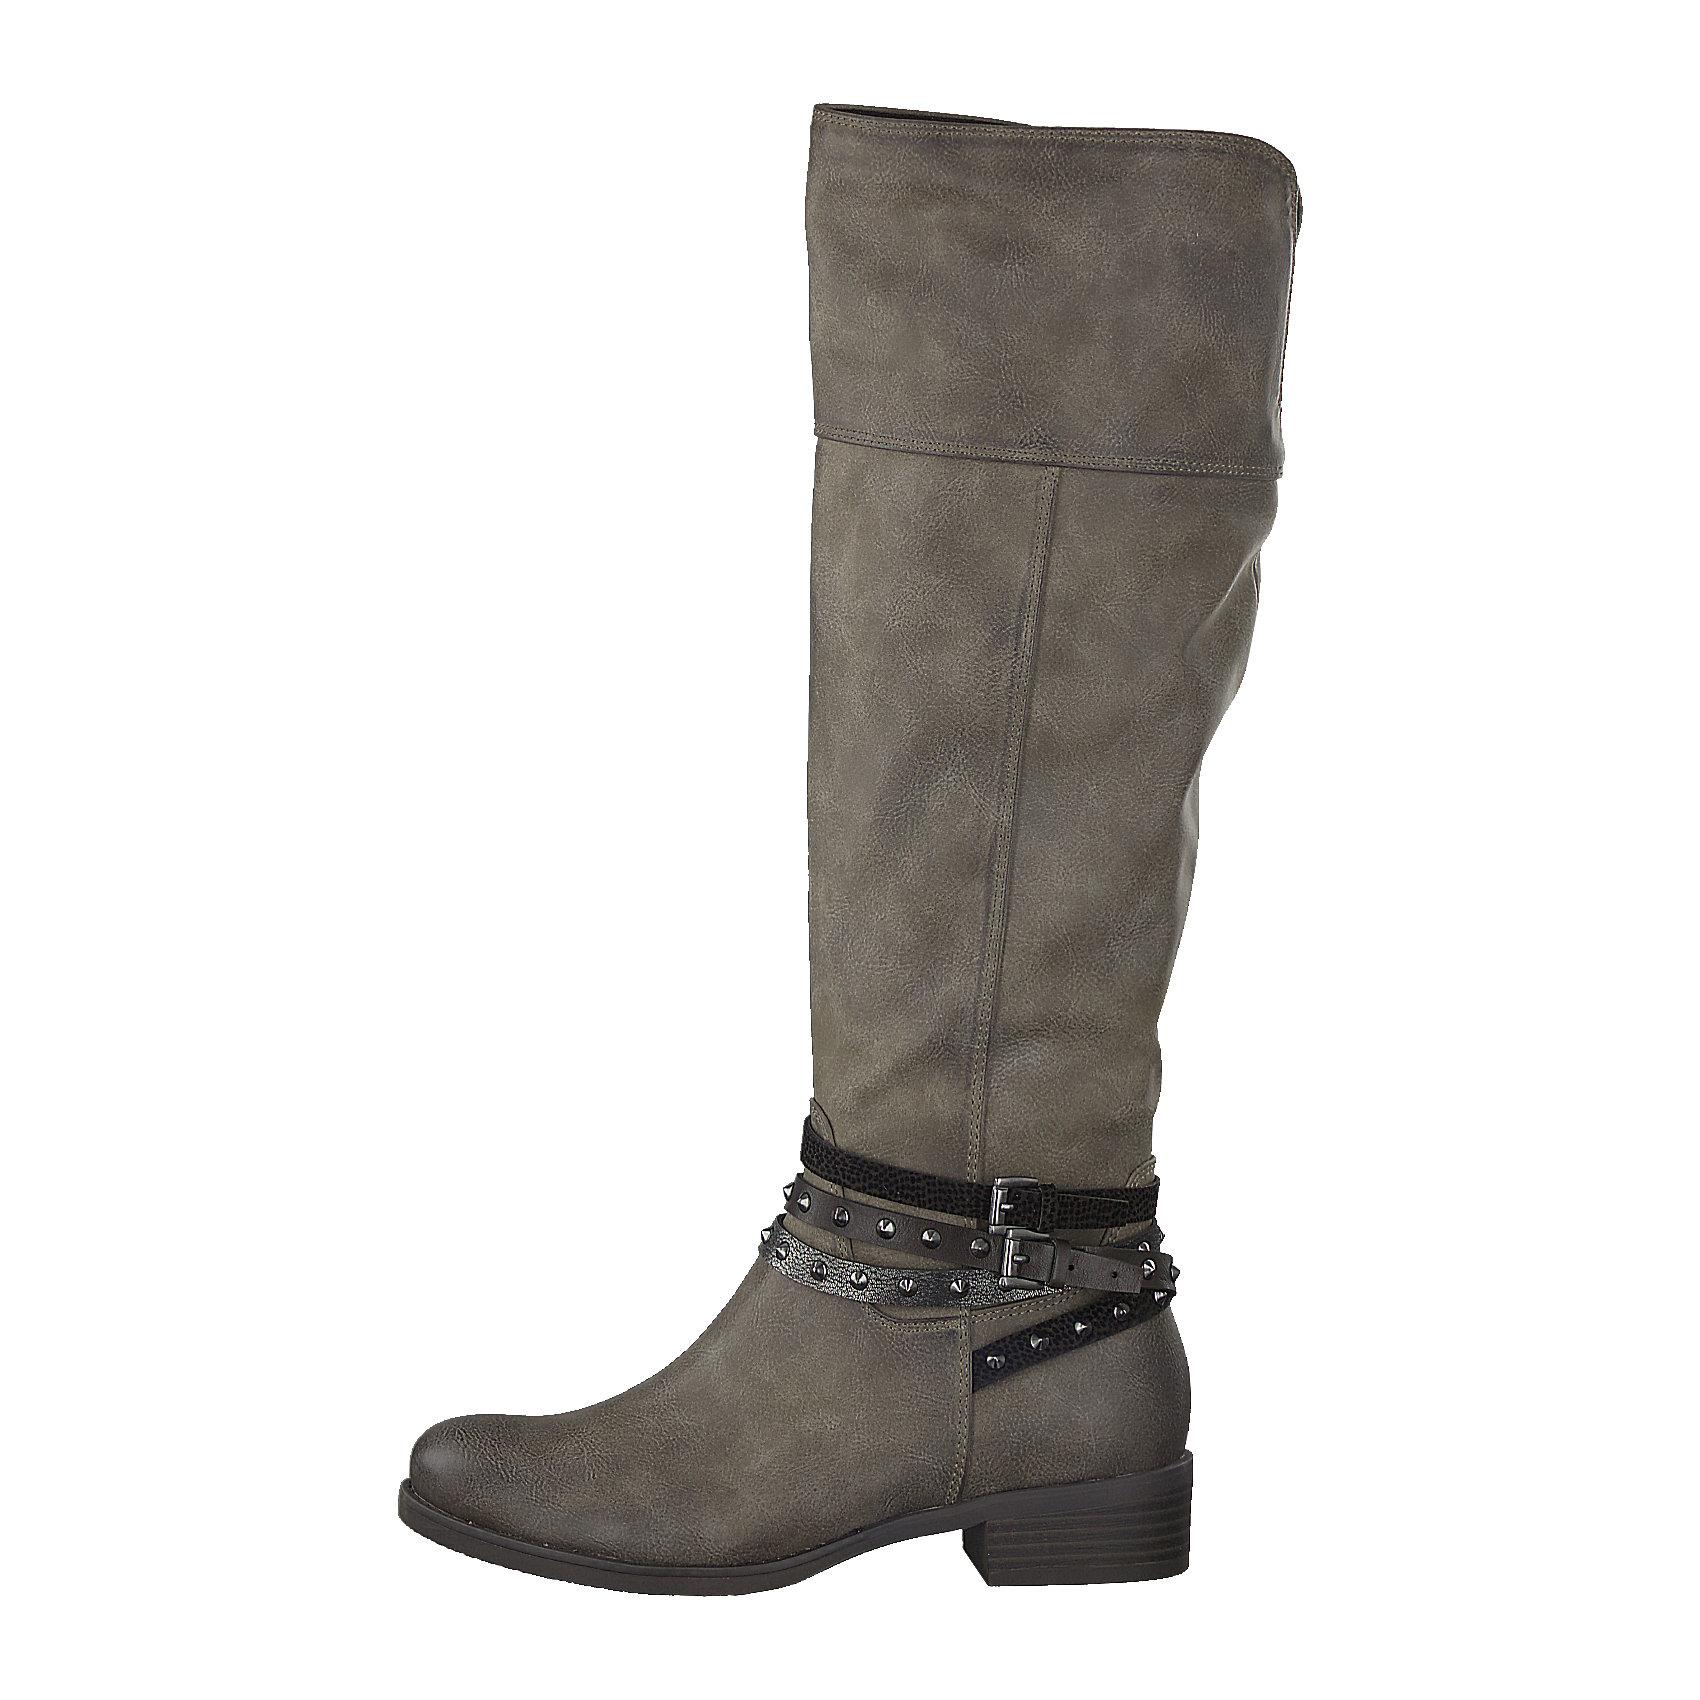 huge selection of 6d963 dfe32 Details zu Neu MARCO TOZZI Stiefel 6993090 für Damen dunkelgrau grau